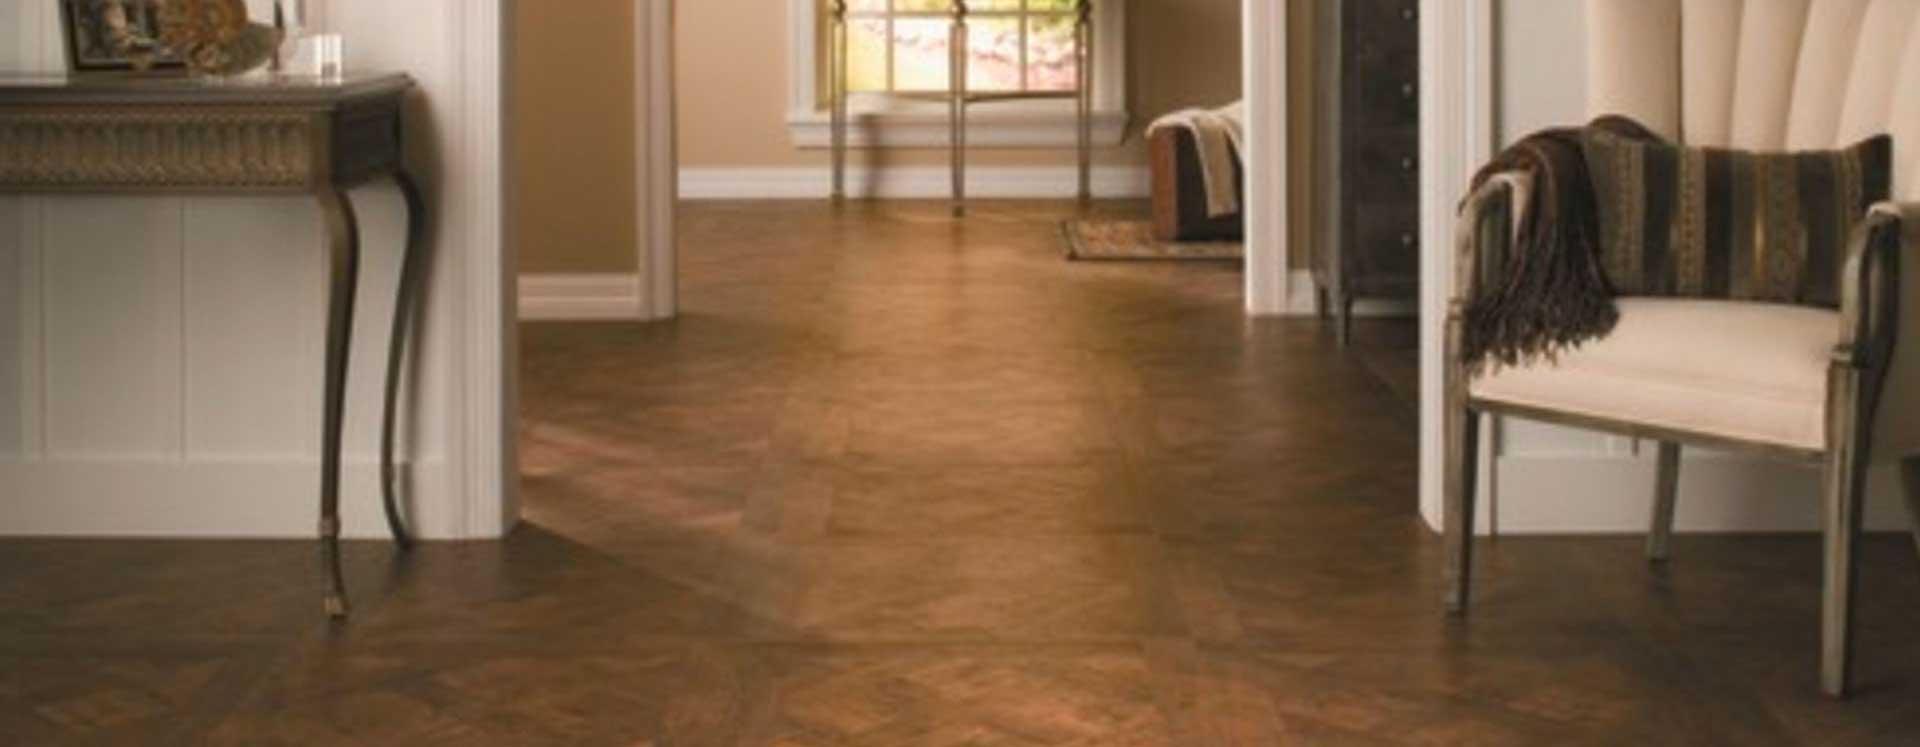 Big Bobs Flooring Birmingham Flooring Store Carpet Hardwood